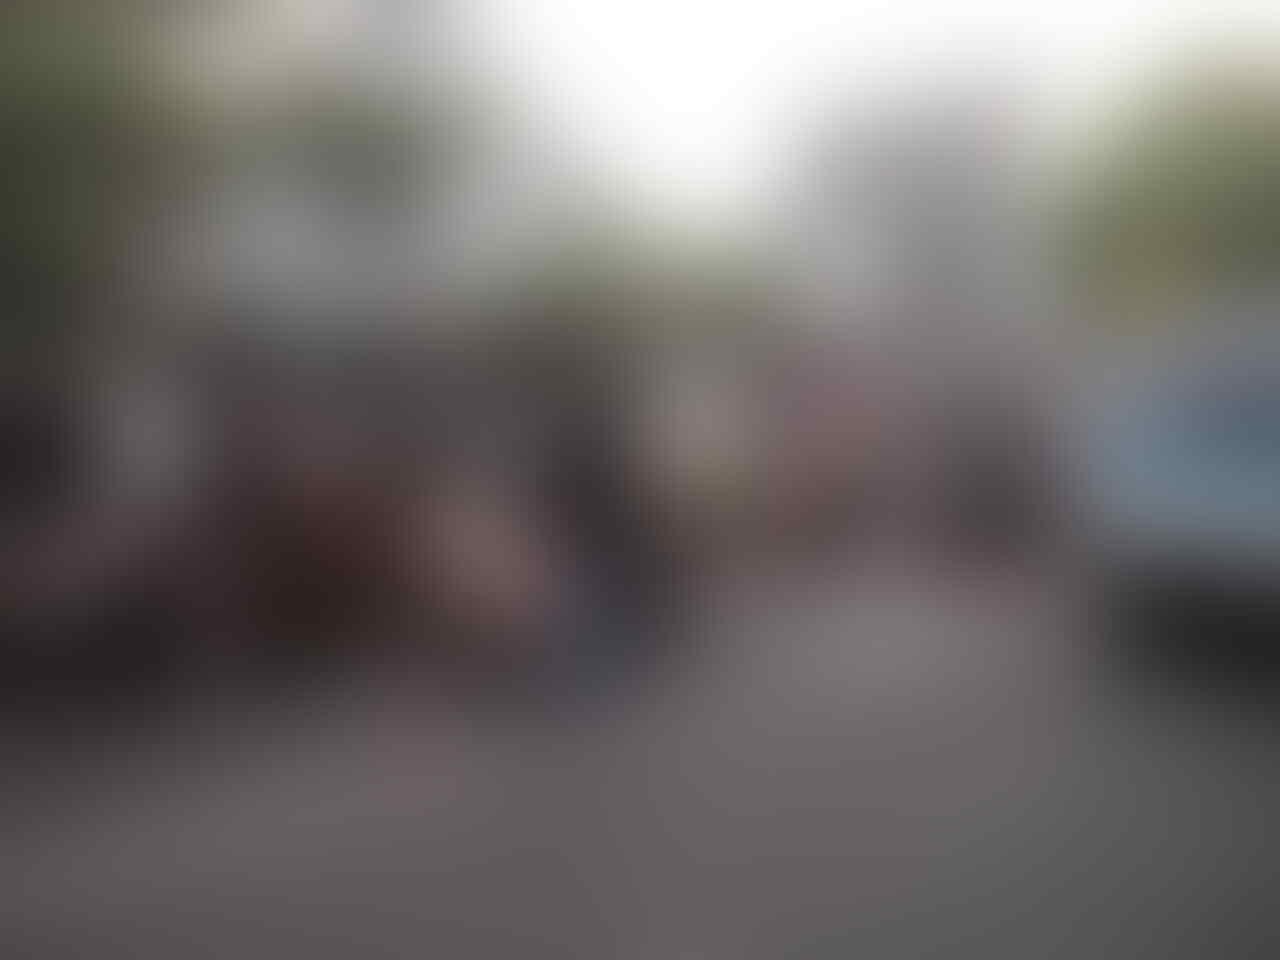 [FR] Kaskus Cendolin Indonesia Jilid 2 & Bagi Takjil   Regional Banyumas